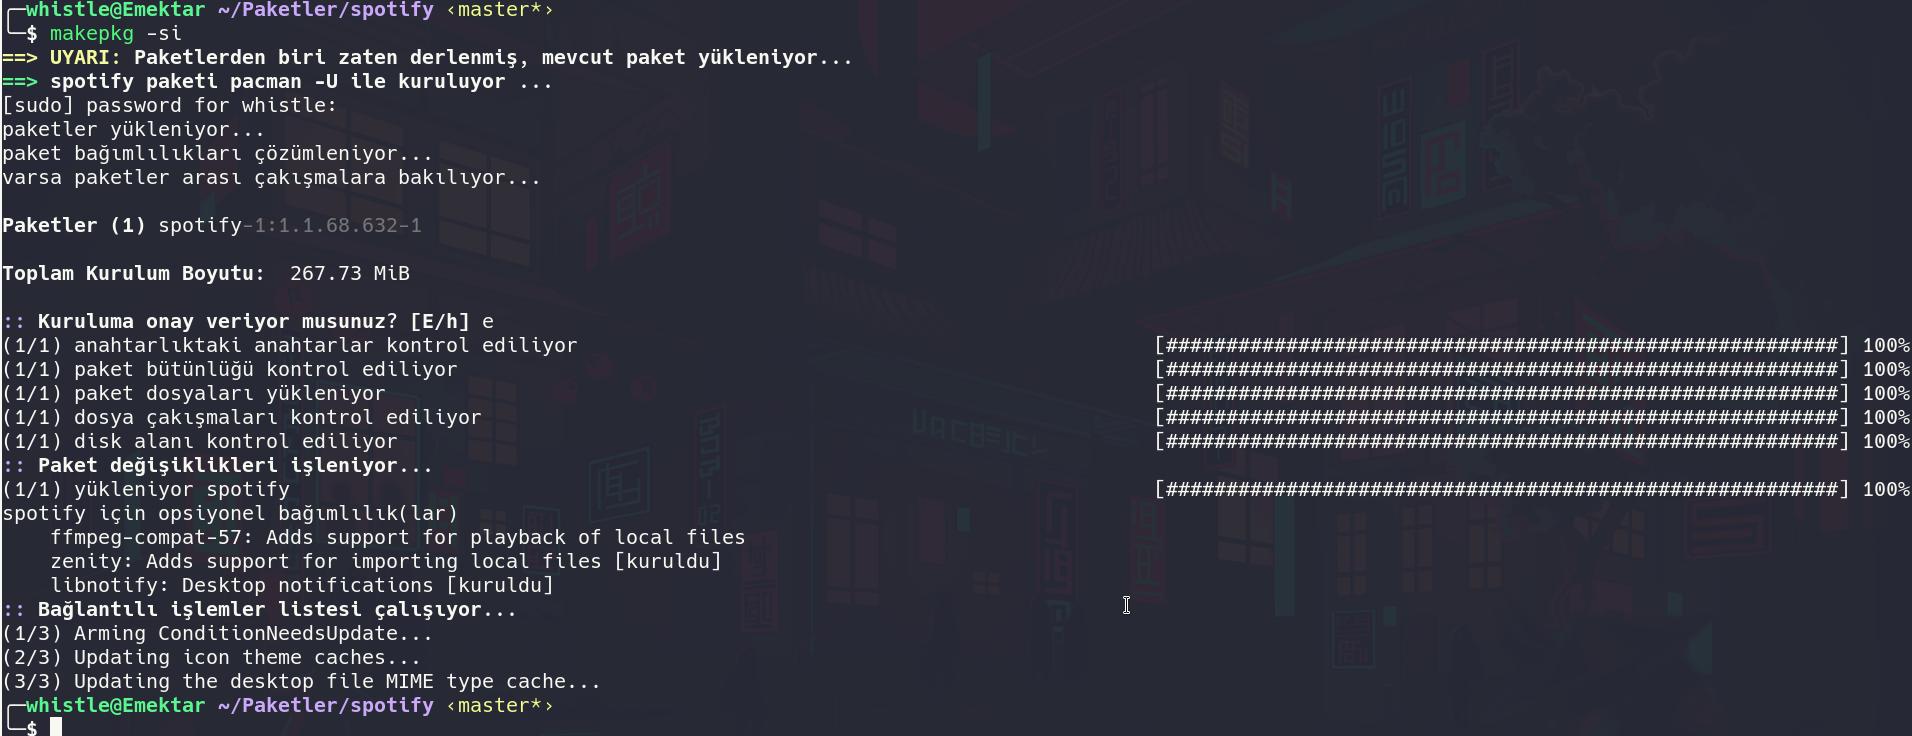 arch linux spotify kurulum hata çözüm kanıtı.png